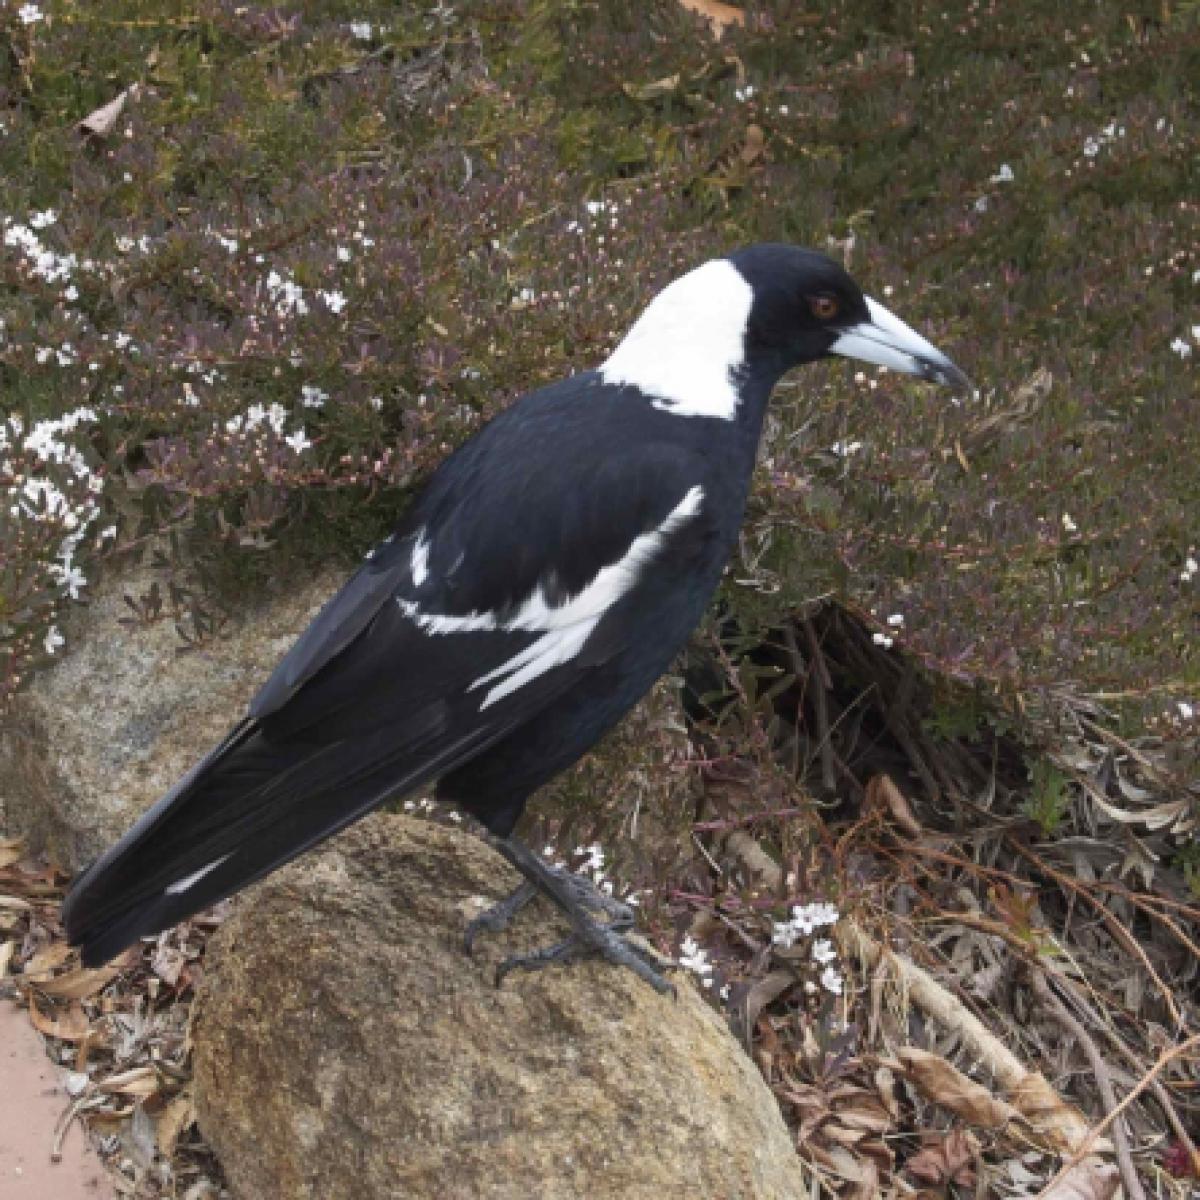 803 Australian Magpie (blackbacked)